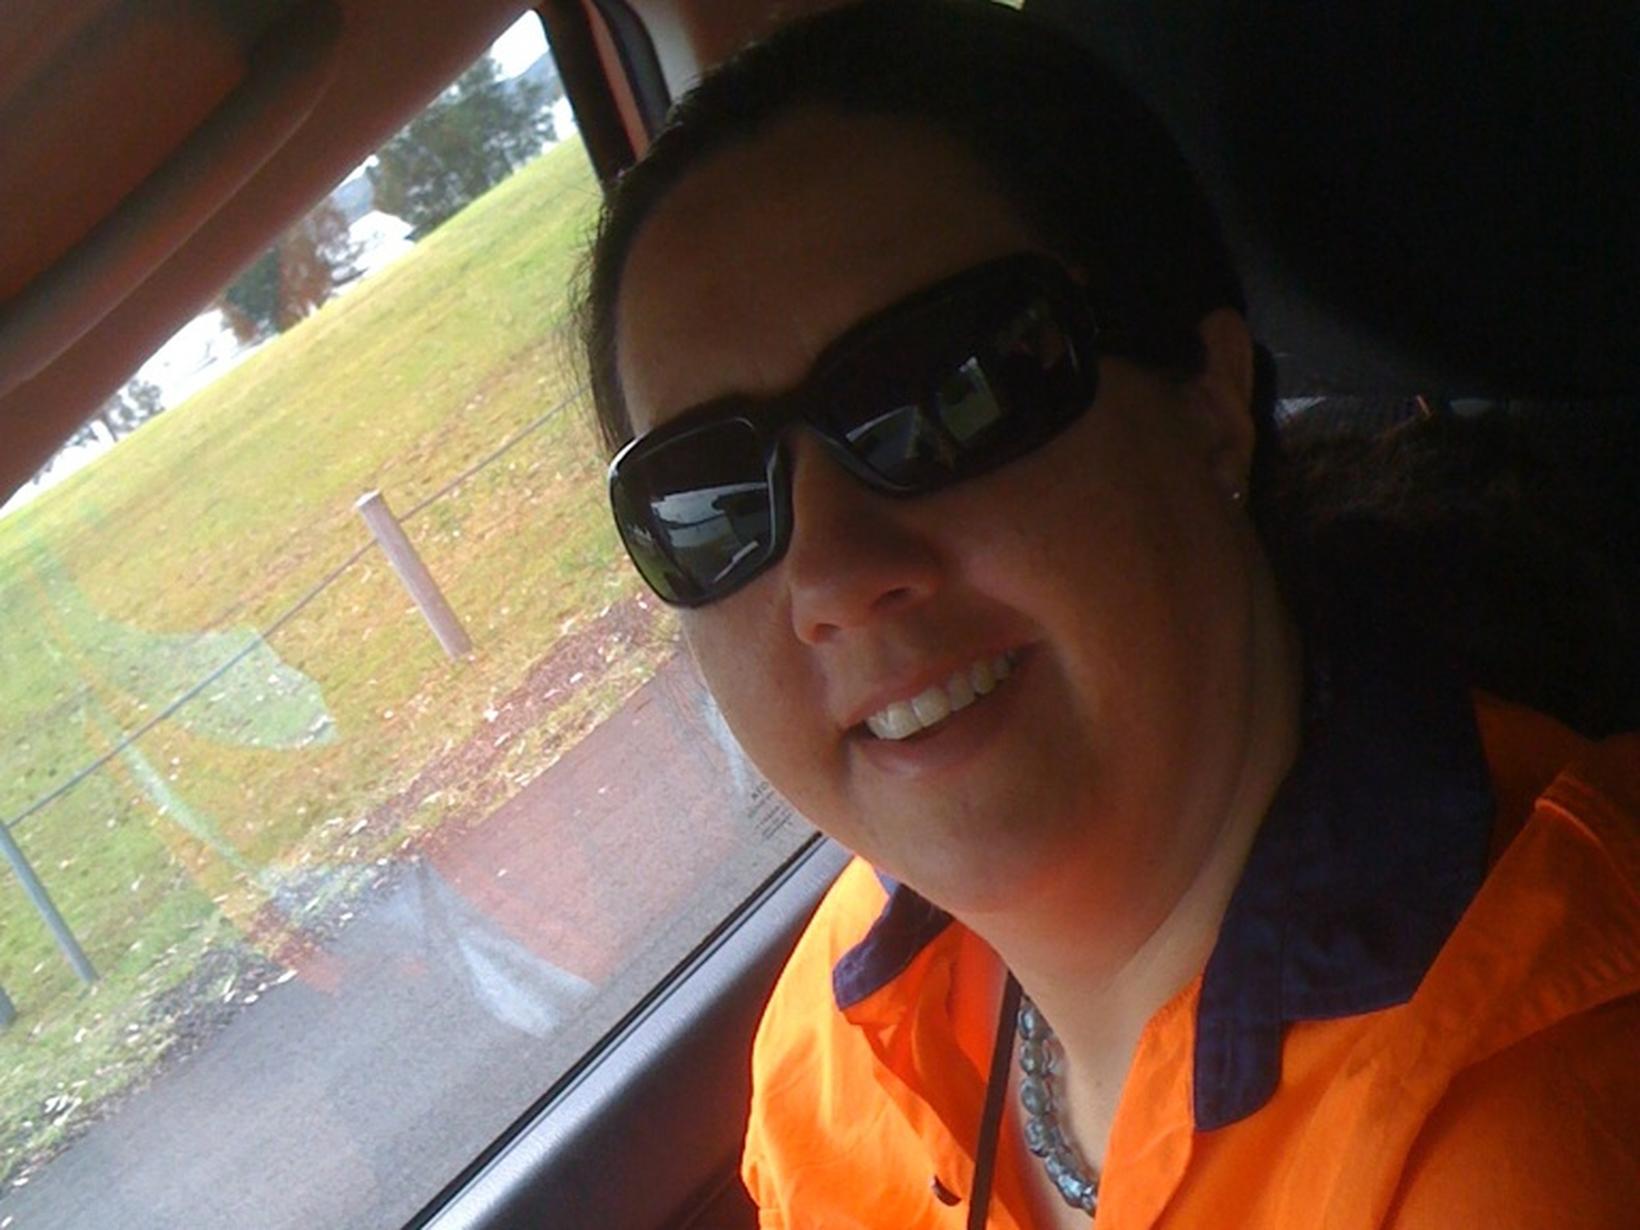 Gen from Melbourne, Victoria, Australia